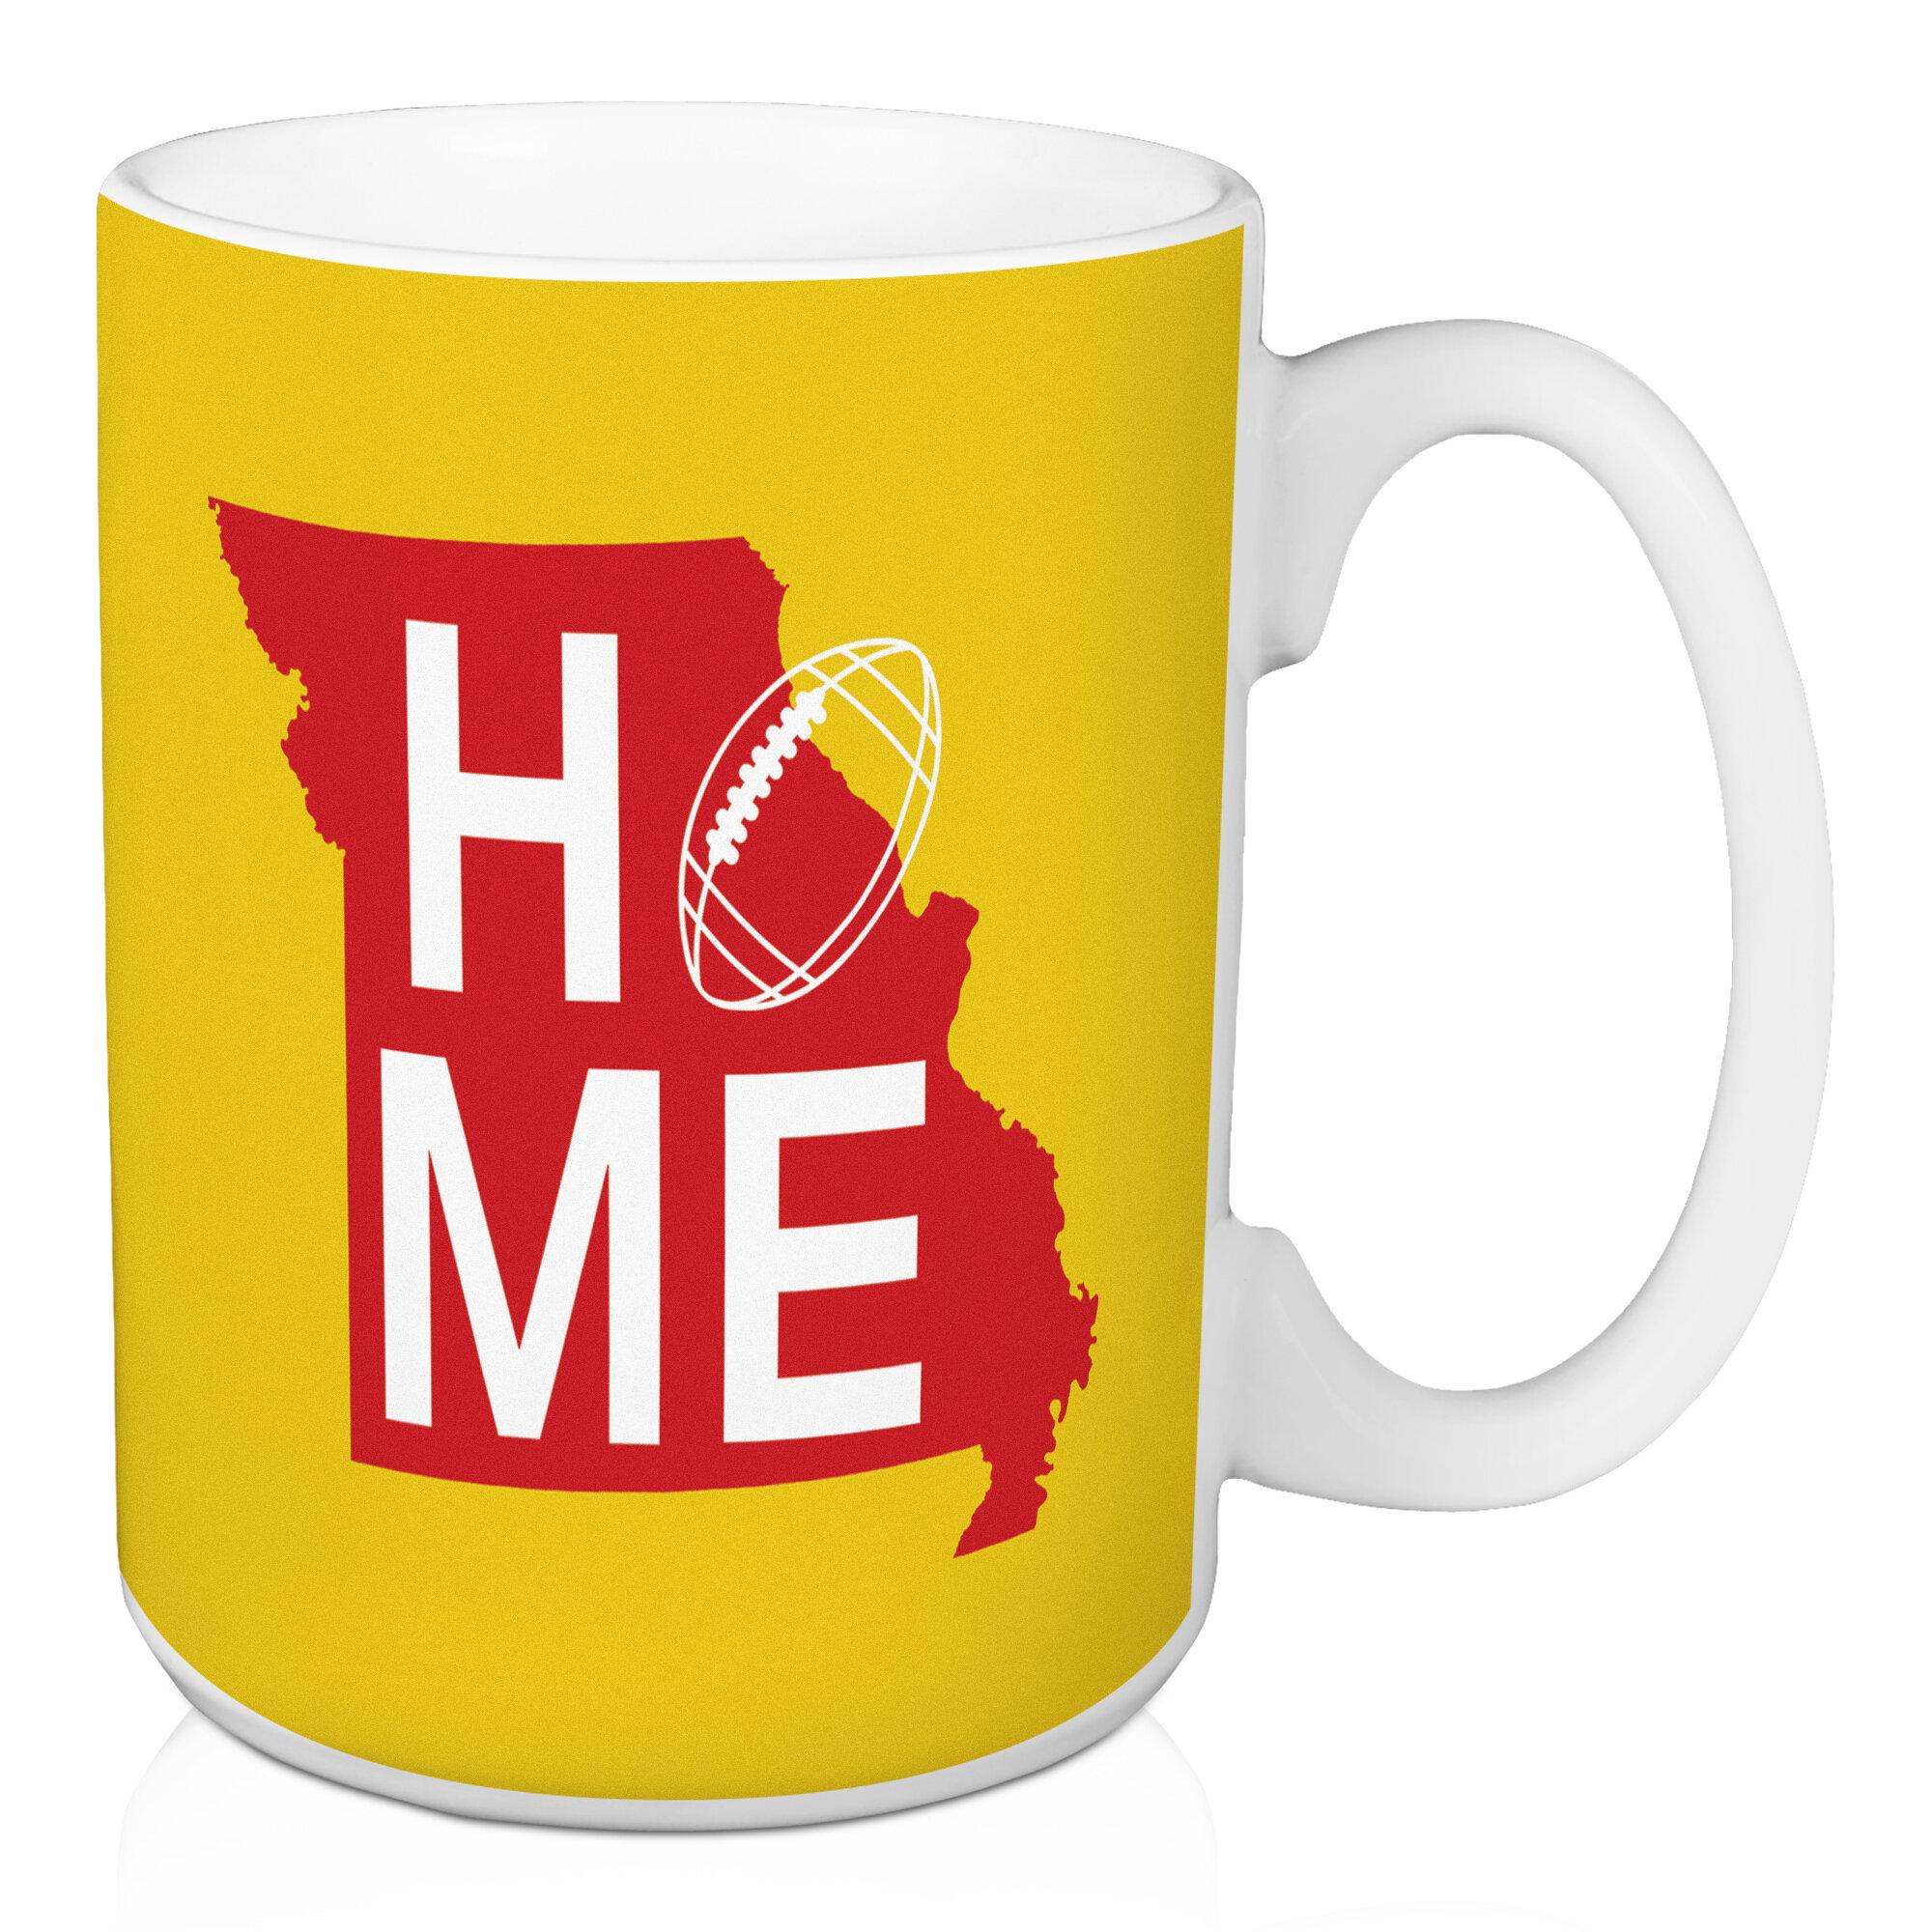 Ebern Designs Fondren Kansas City Home Football Coffee Mug | Wayfair